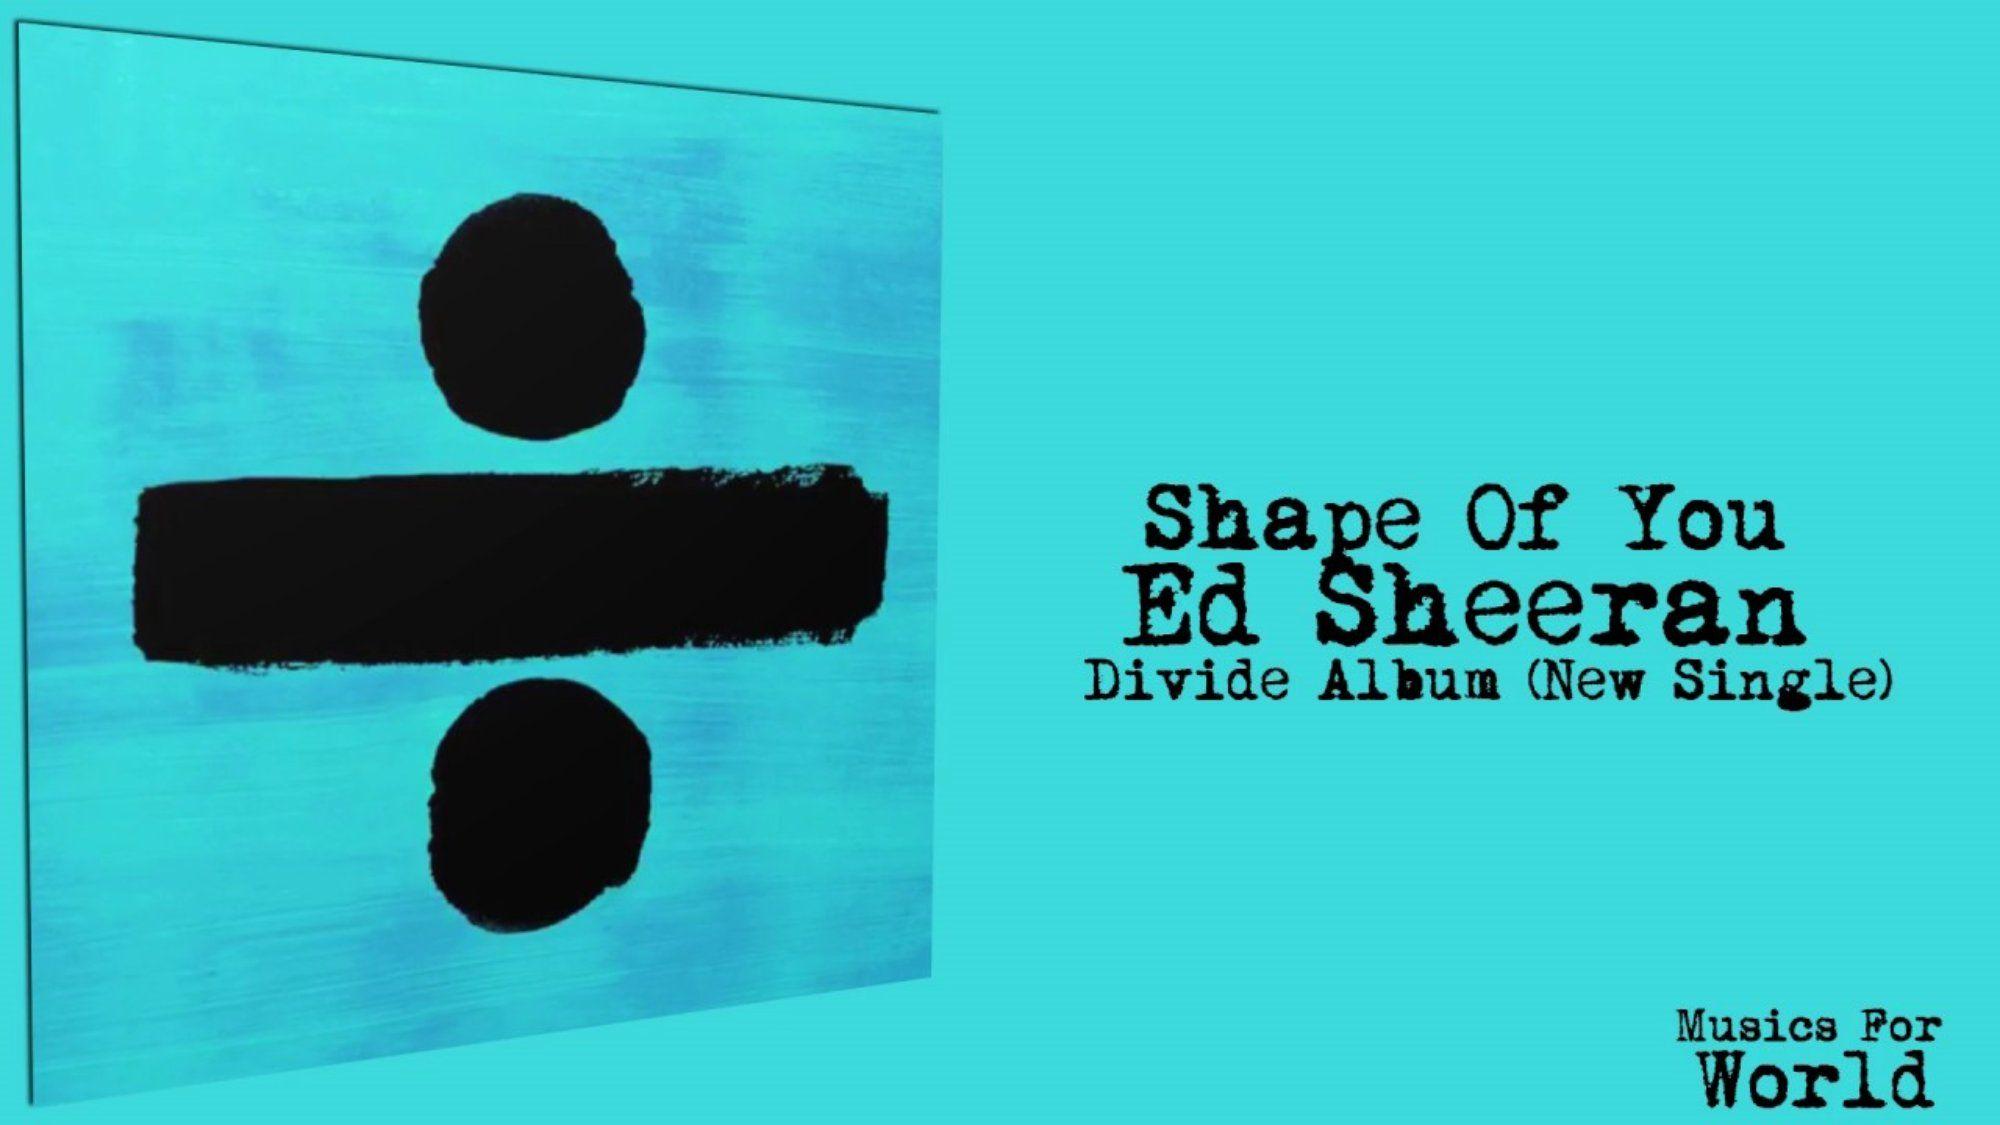 With You Skachat Mp3 Besplatno Ed Sheeran Divide Album Ed Sheeran Castle On The Hill Ed Sheeran